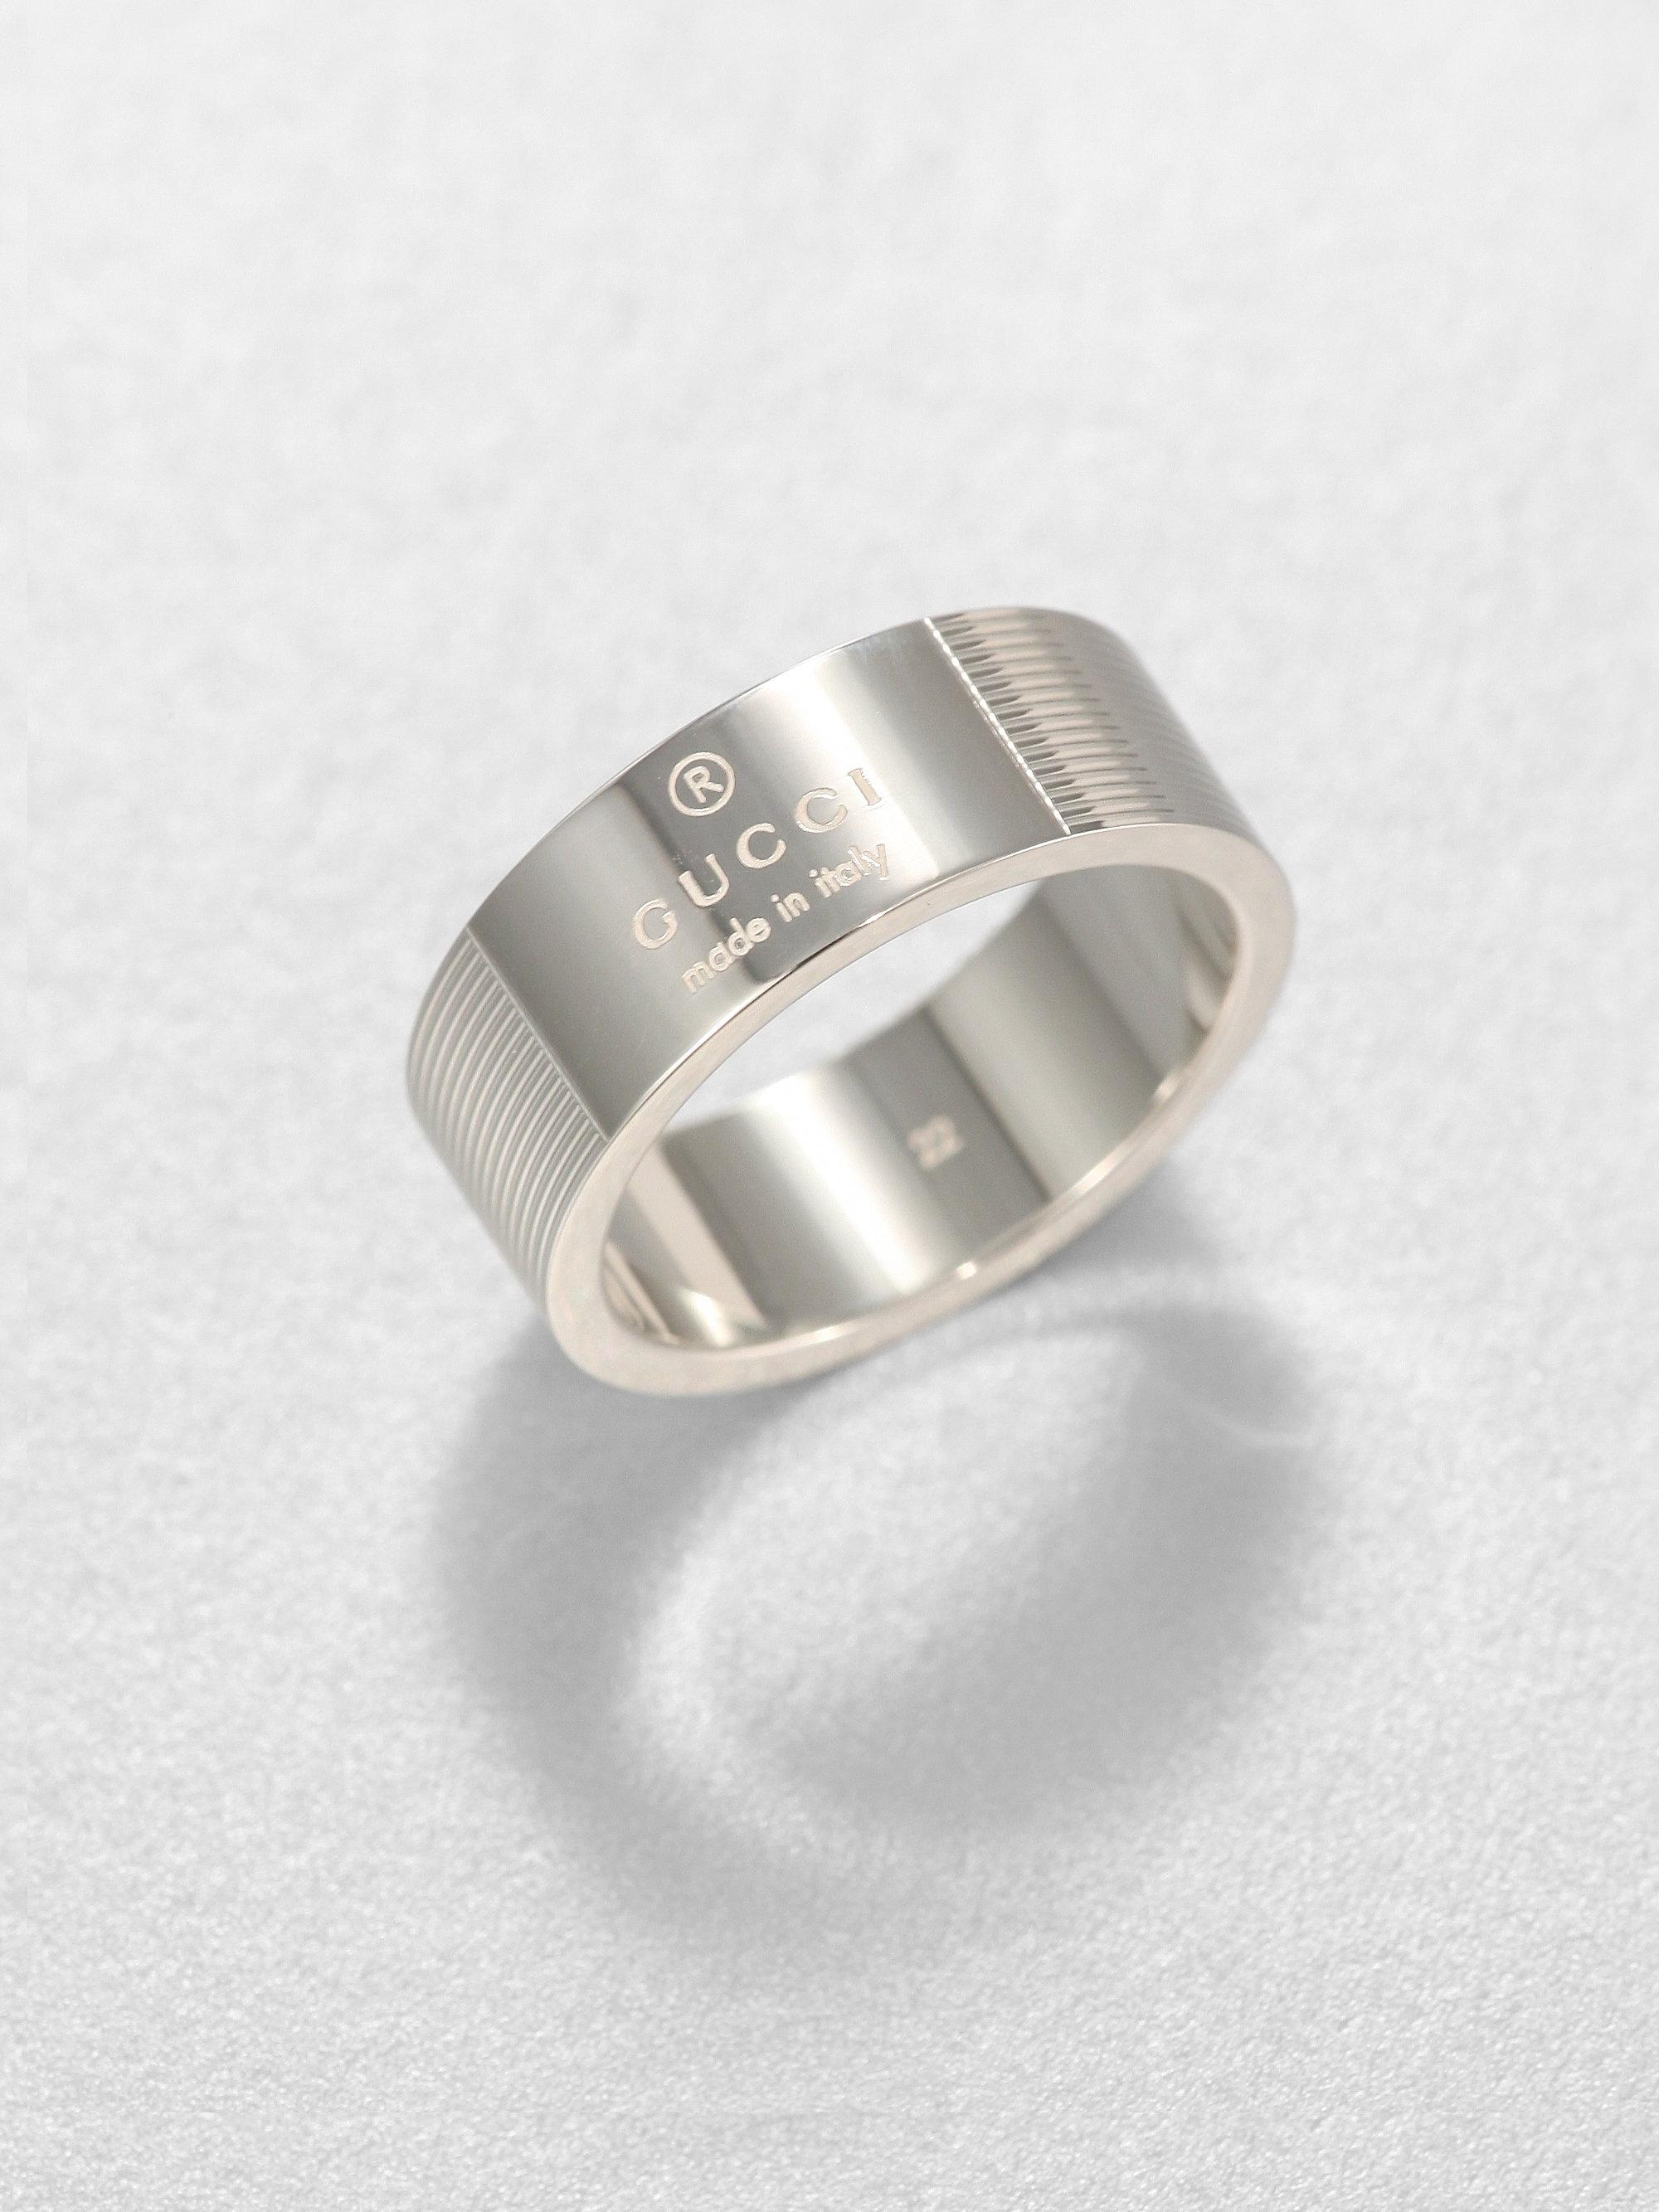 eb5dedc8165 Lyst - Gucci Stripes Ring in Metallic for Men